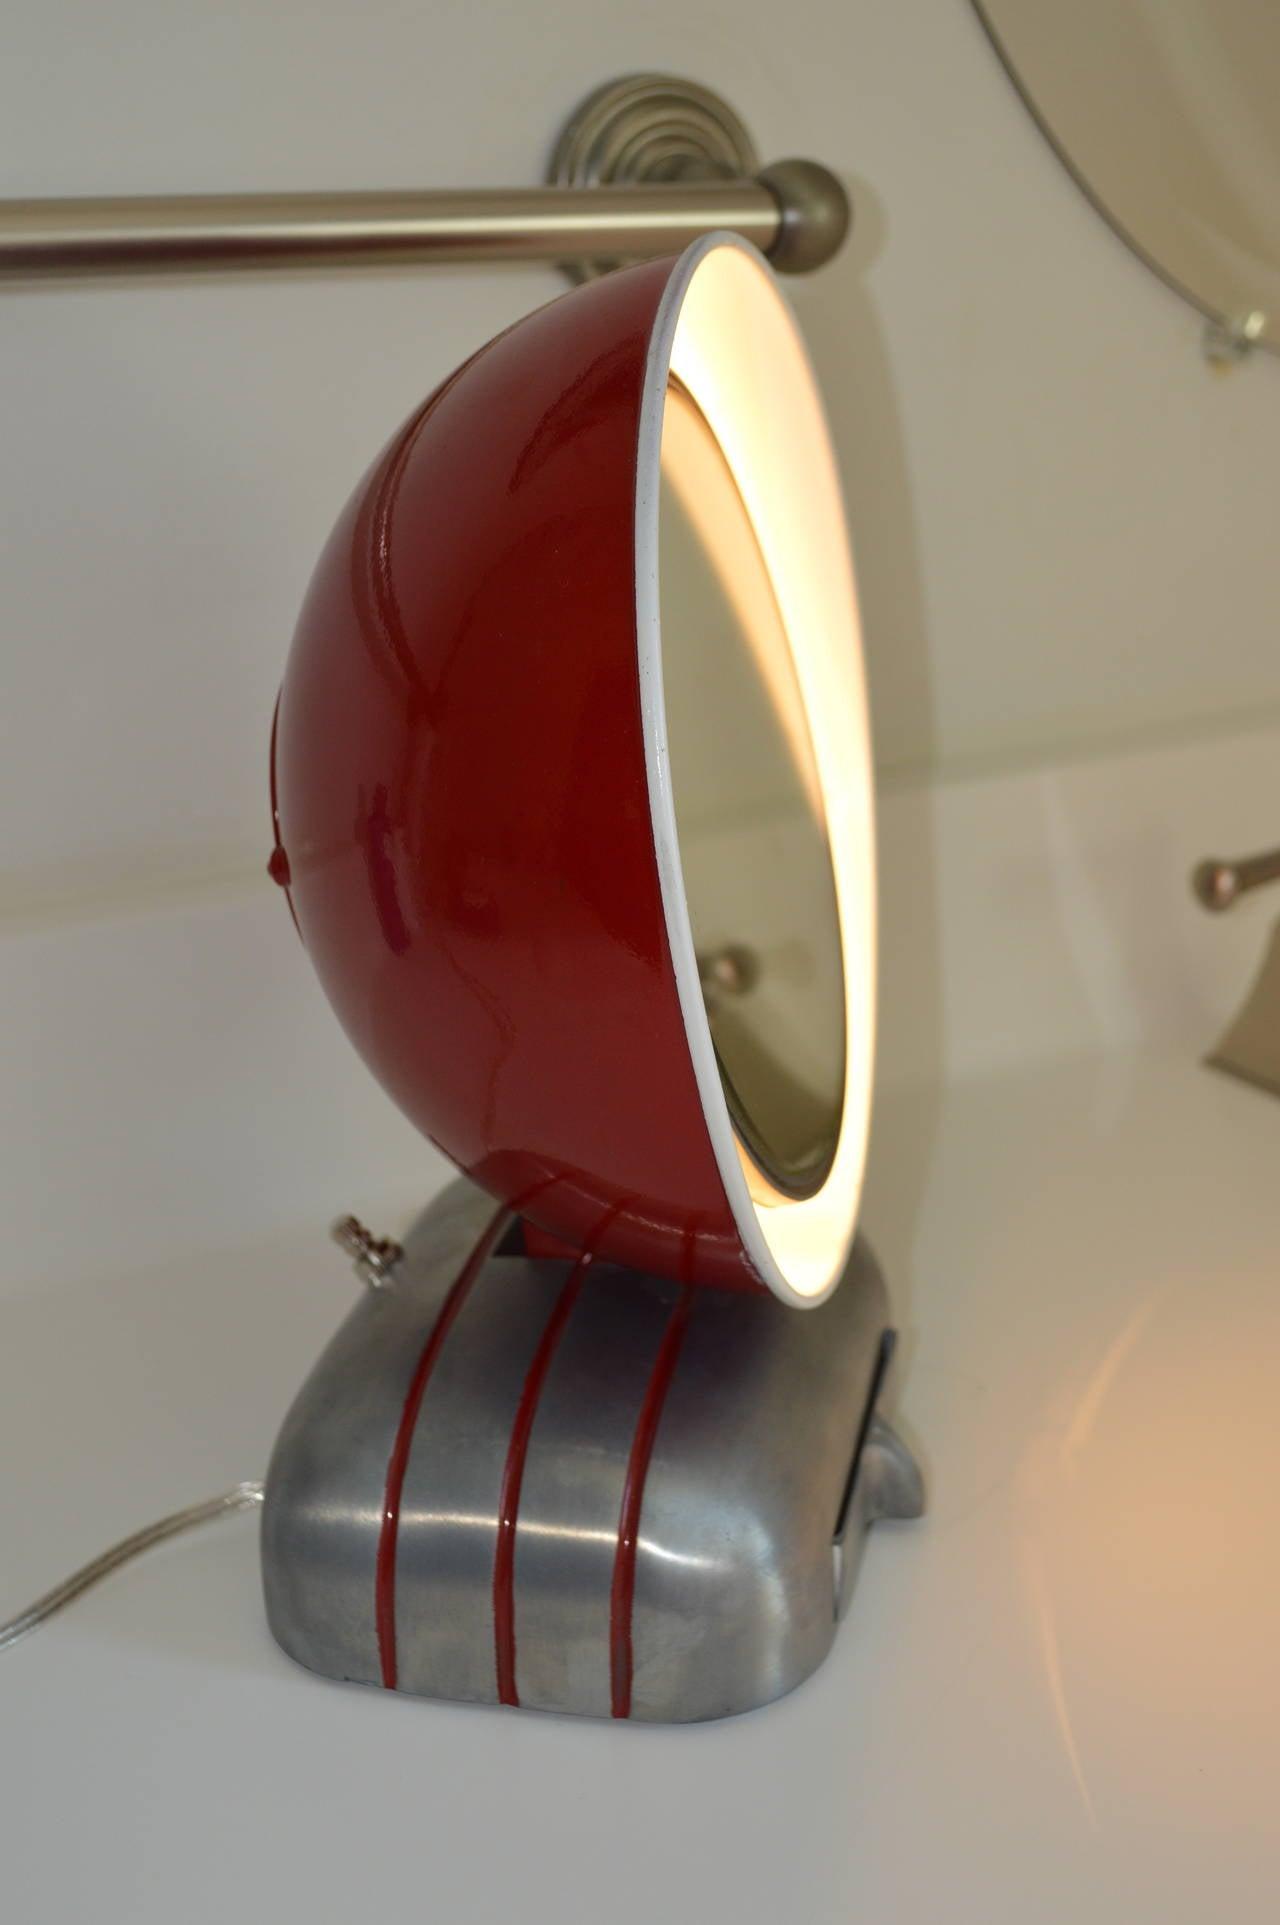 1920s art deco mirolite illuminated vanity mirror at 1stdibs. Black Bedroom Furniture Sets. Home Design Ideas